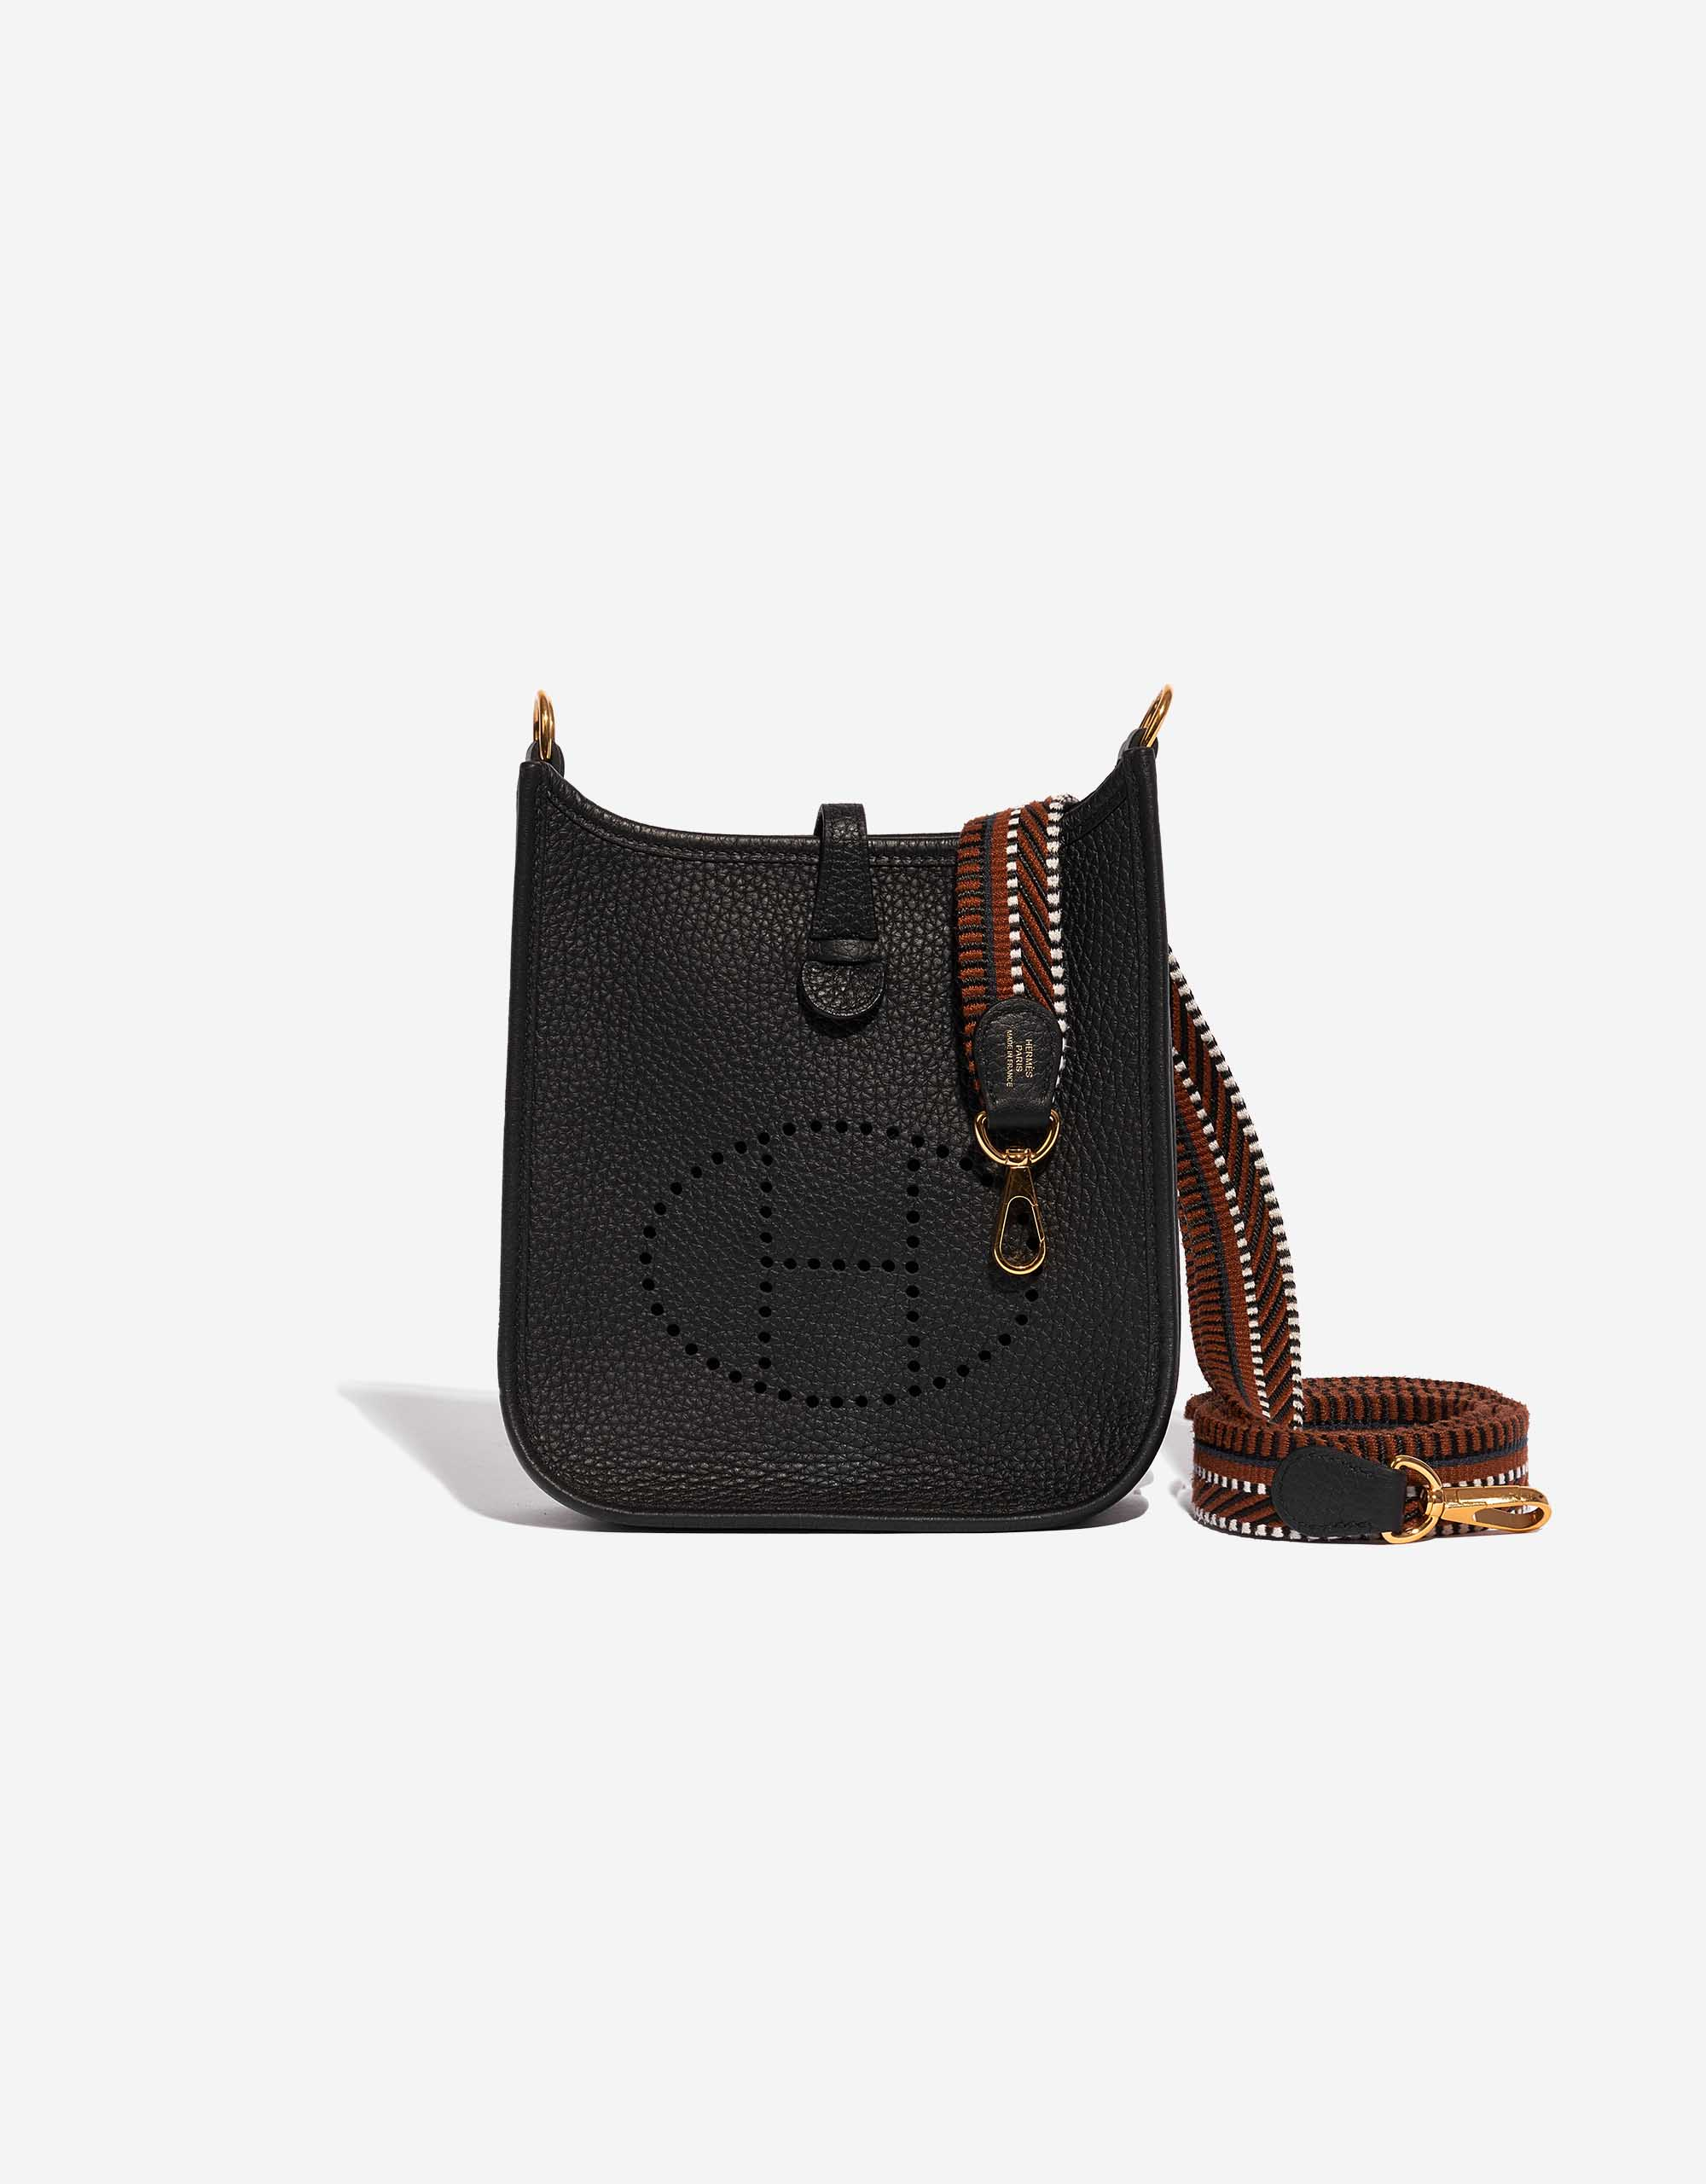 Hermès Evelyne 16 Clemence Black / Noisette | SACLÀB